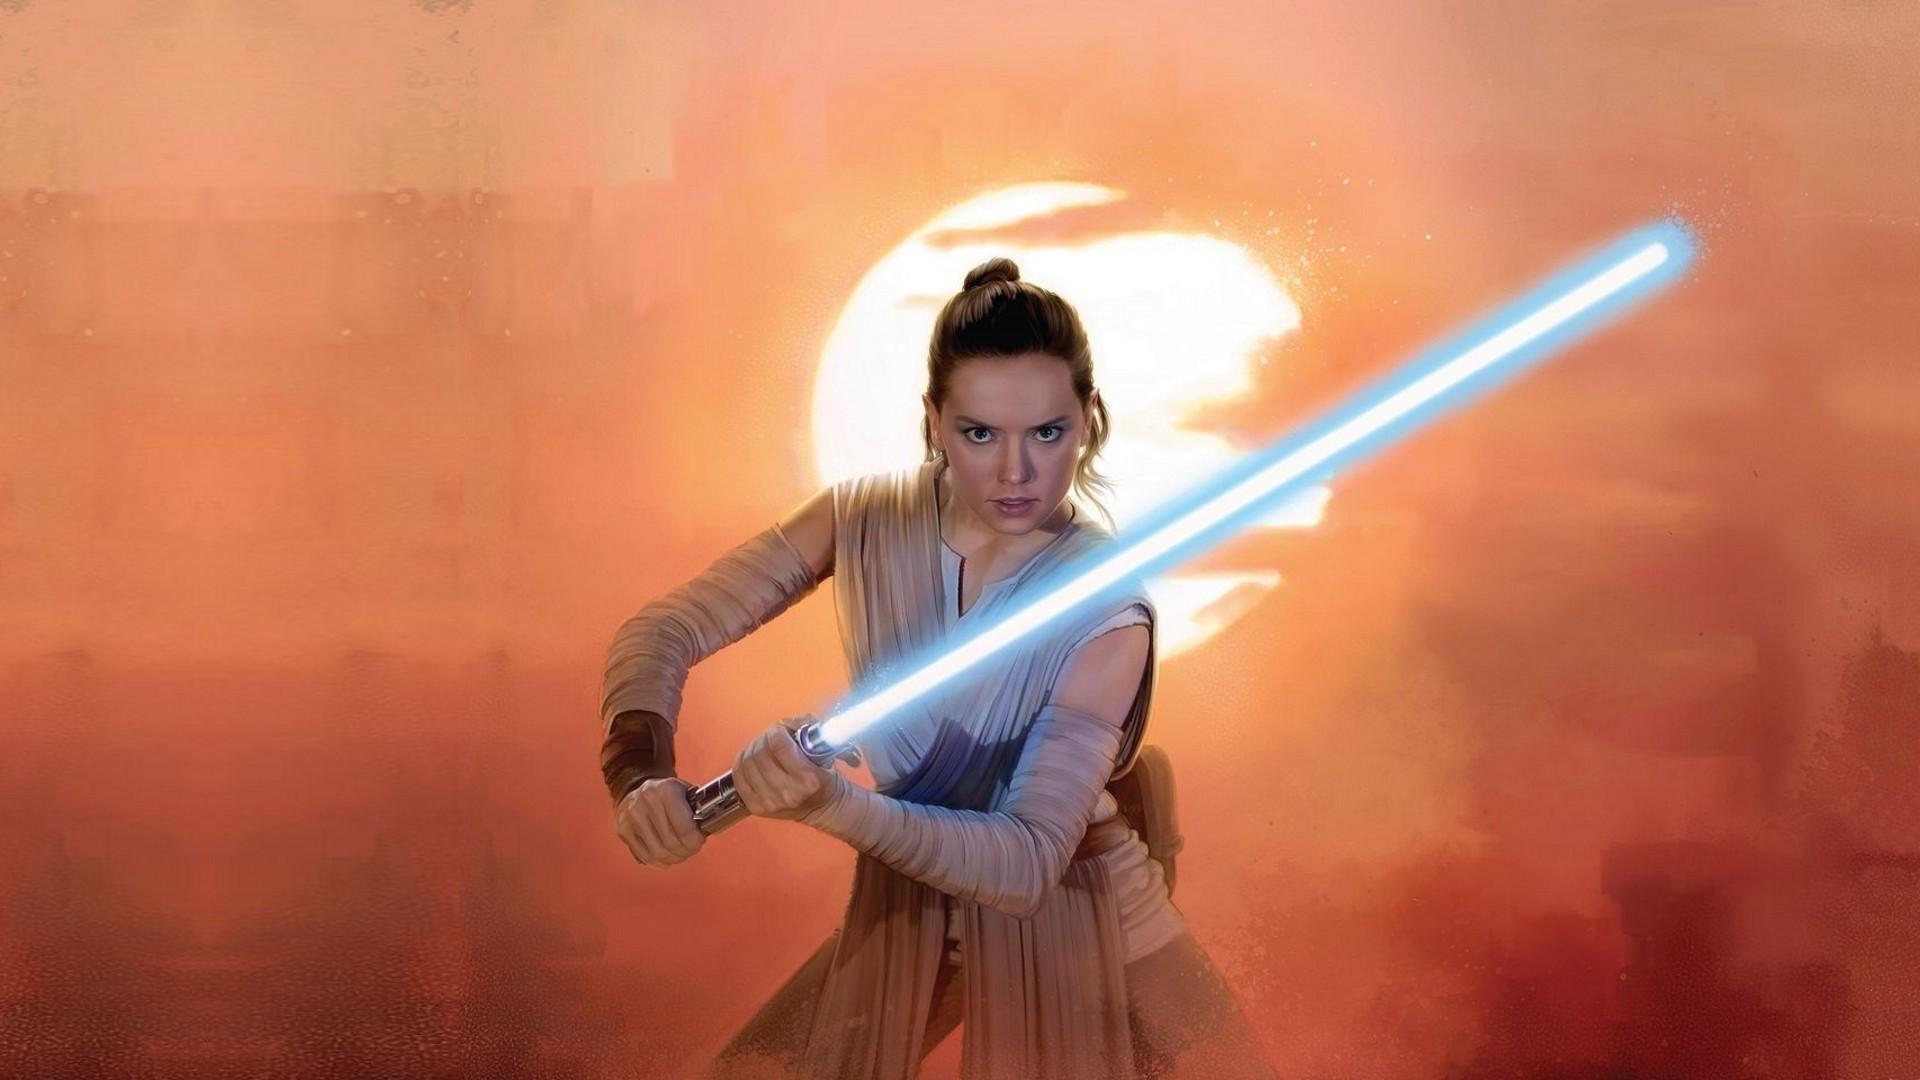 Daisy ridley wallpaper 71 images - Jedi wallpaper ...